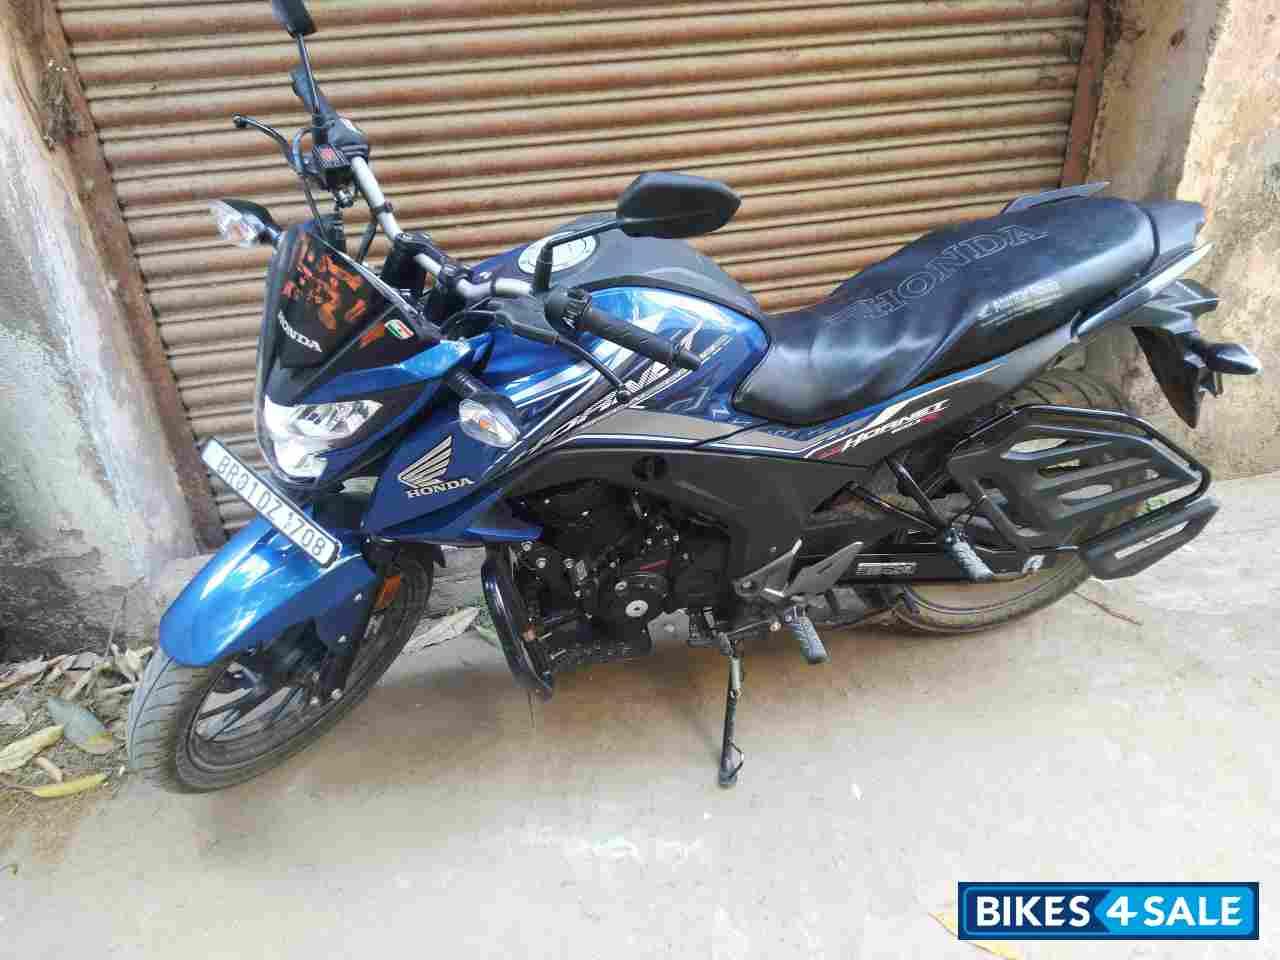 Used 2018 Model Honda Cb Hornet 160r Abs For Sale In Patna Id 209913 Blue Colour Bikes4sale